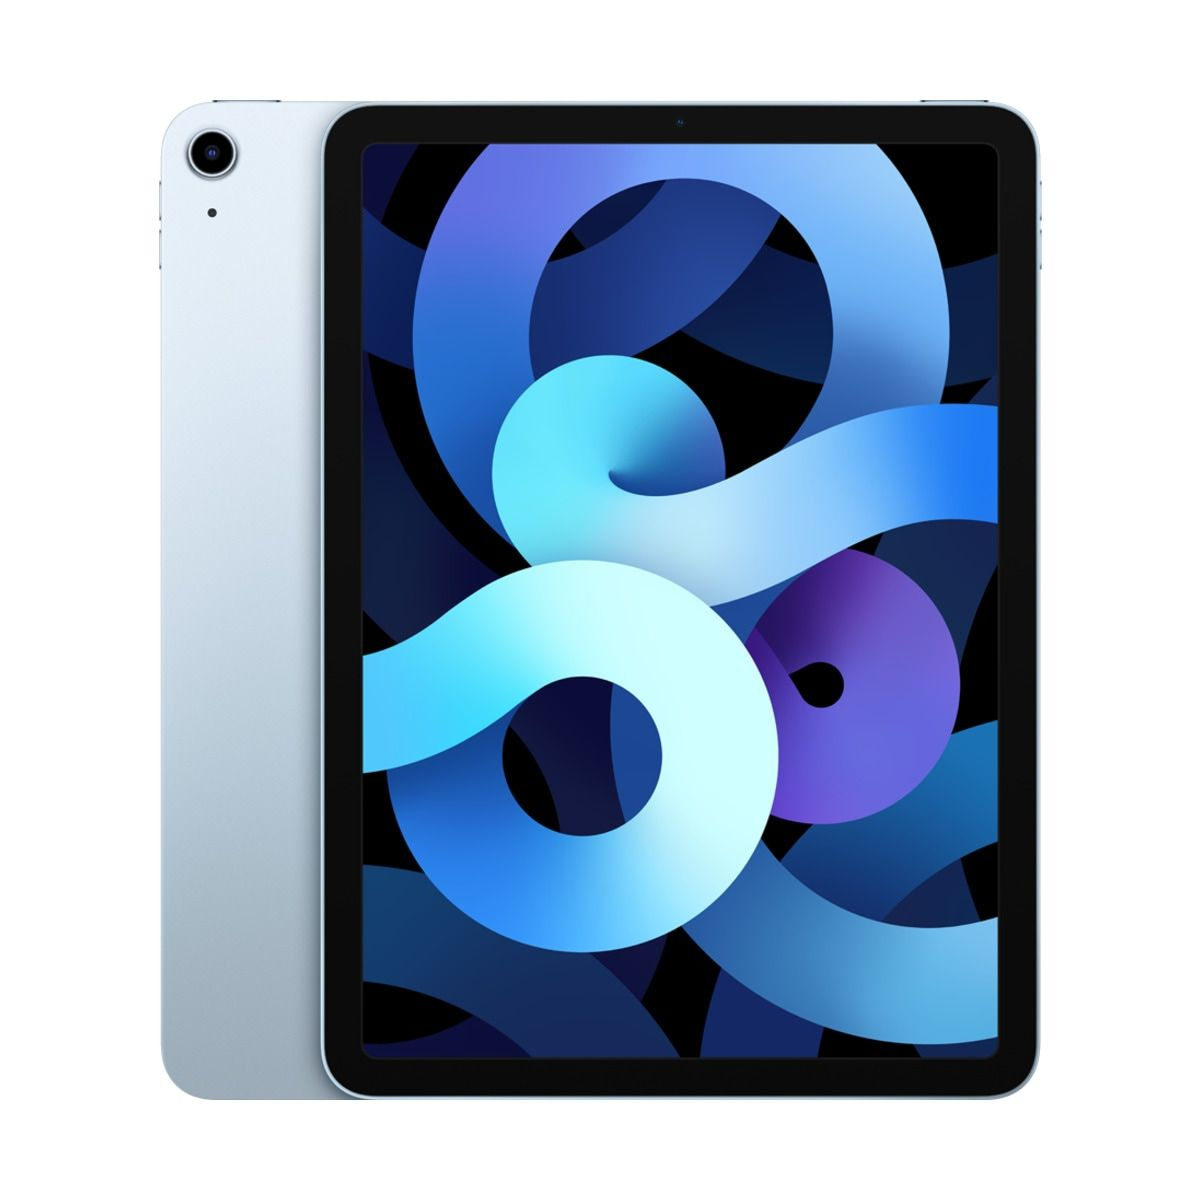 Apple iPad Air Wi-Fi+Cell 256GB - Sky Blue - MYH62FD/A